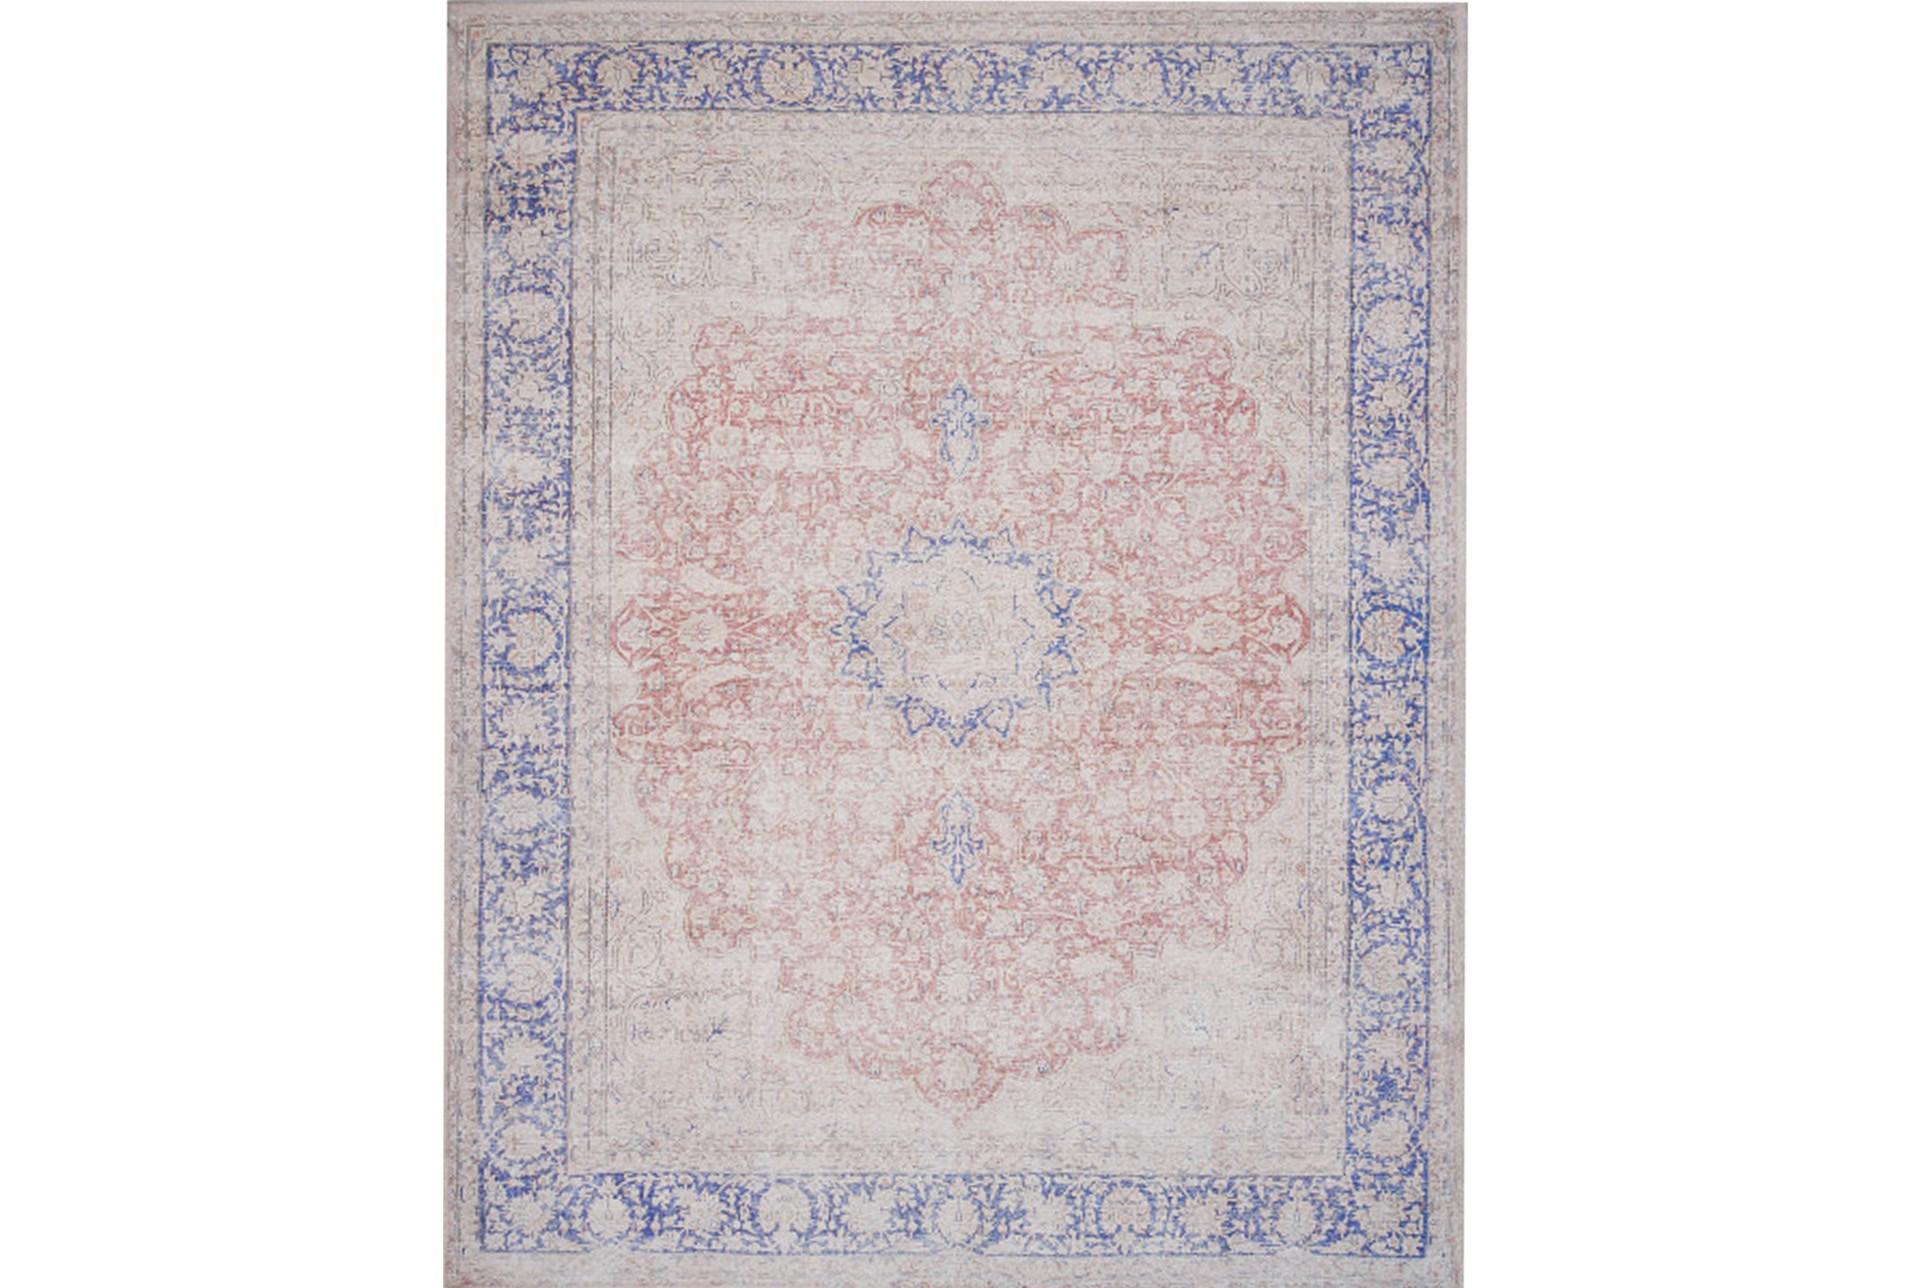 home area floral rugs of magnolia rose products rug shades blue ella lt dk light